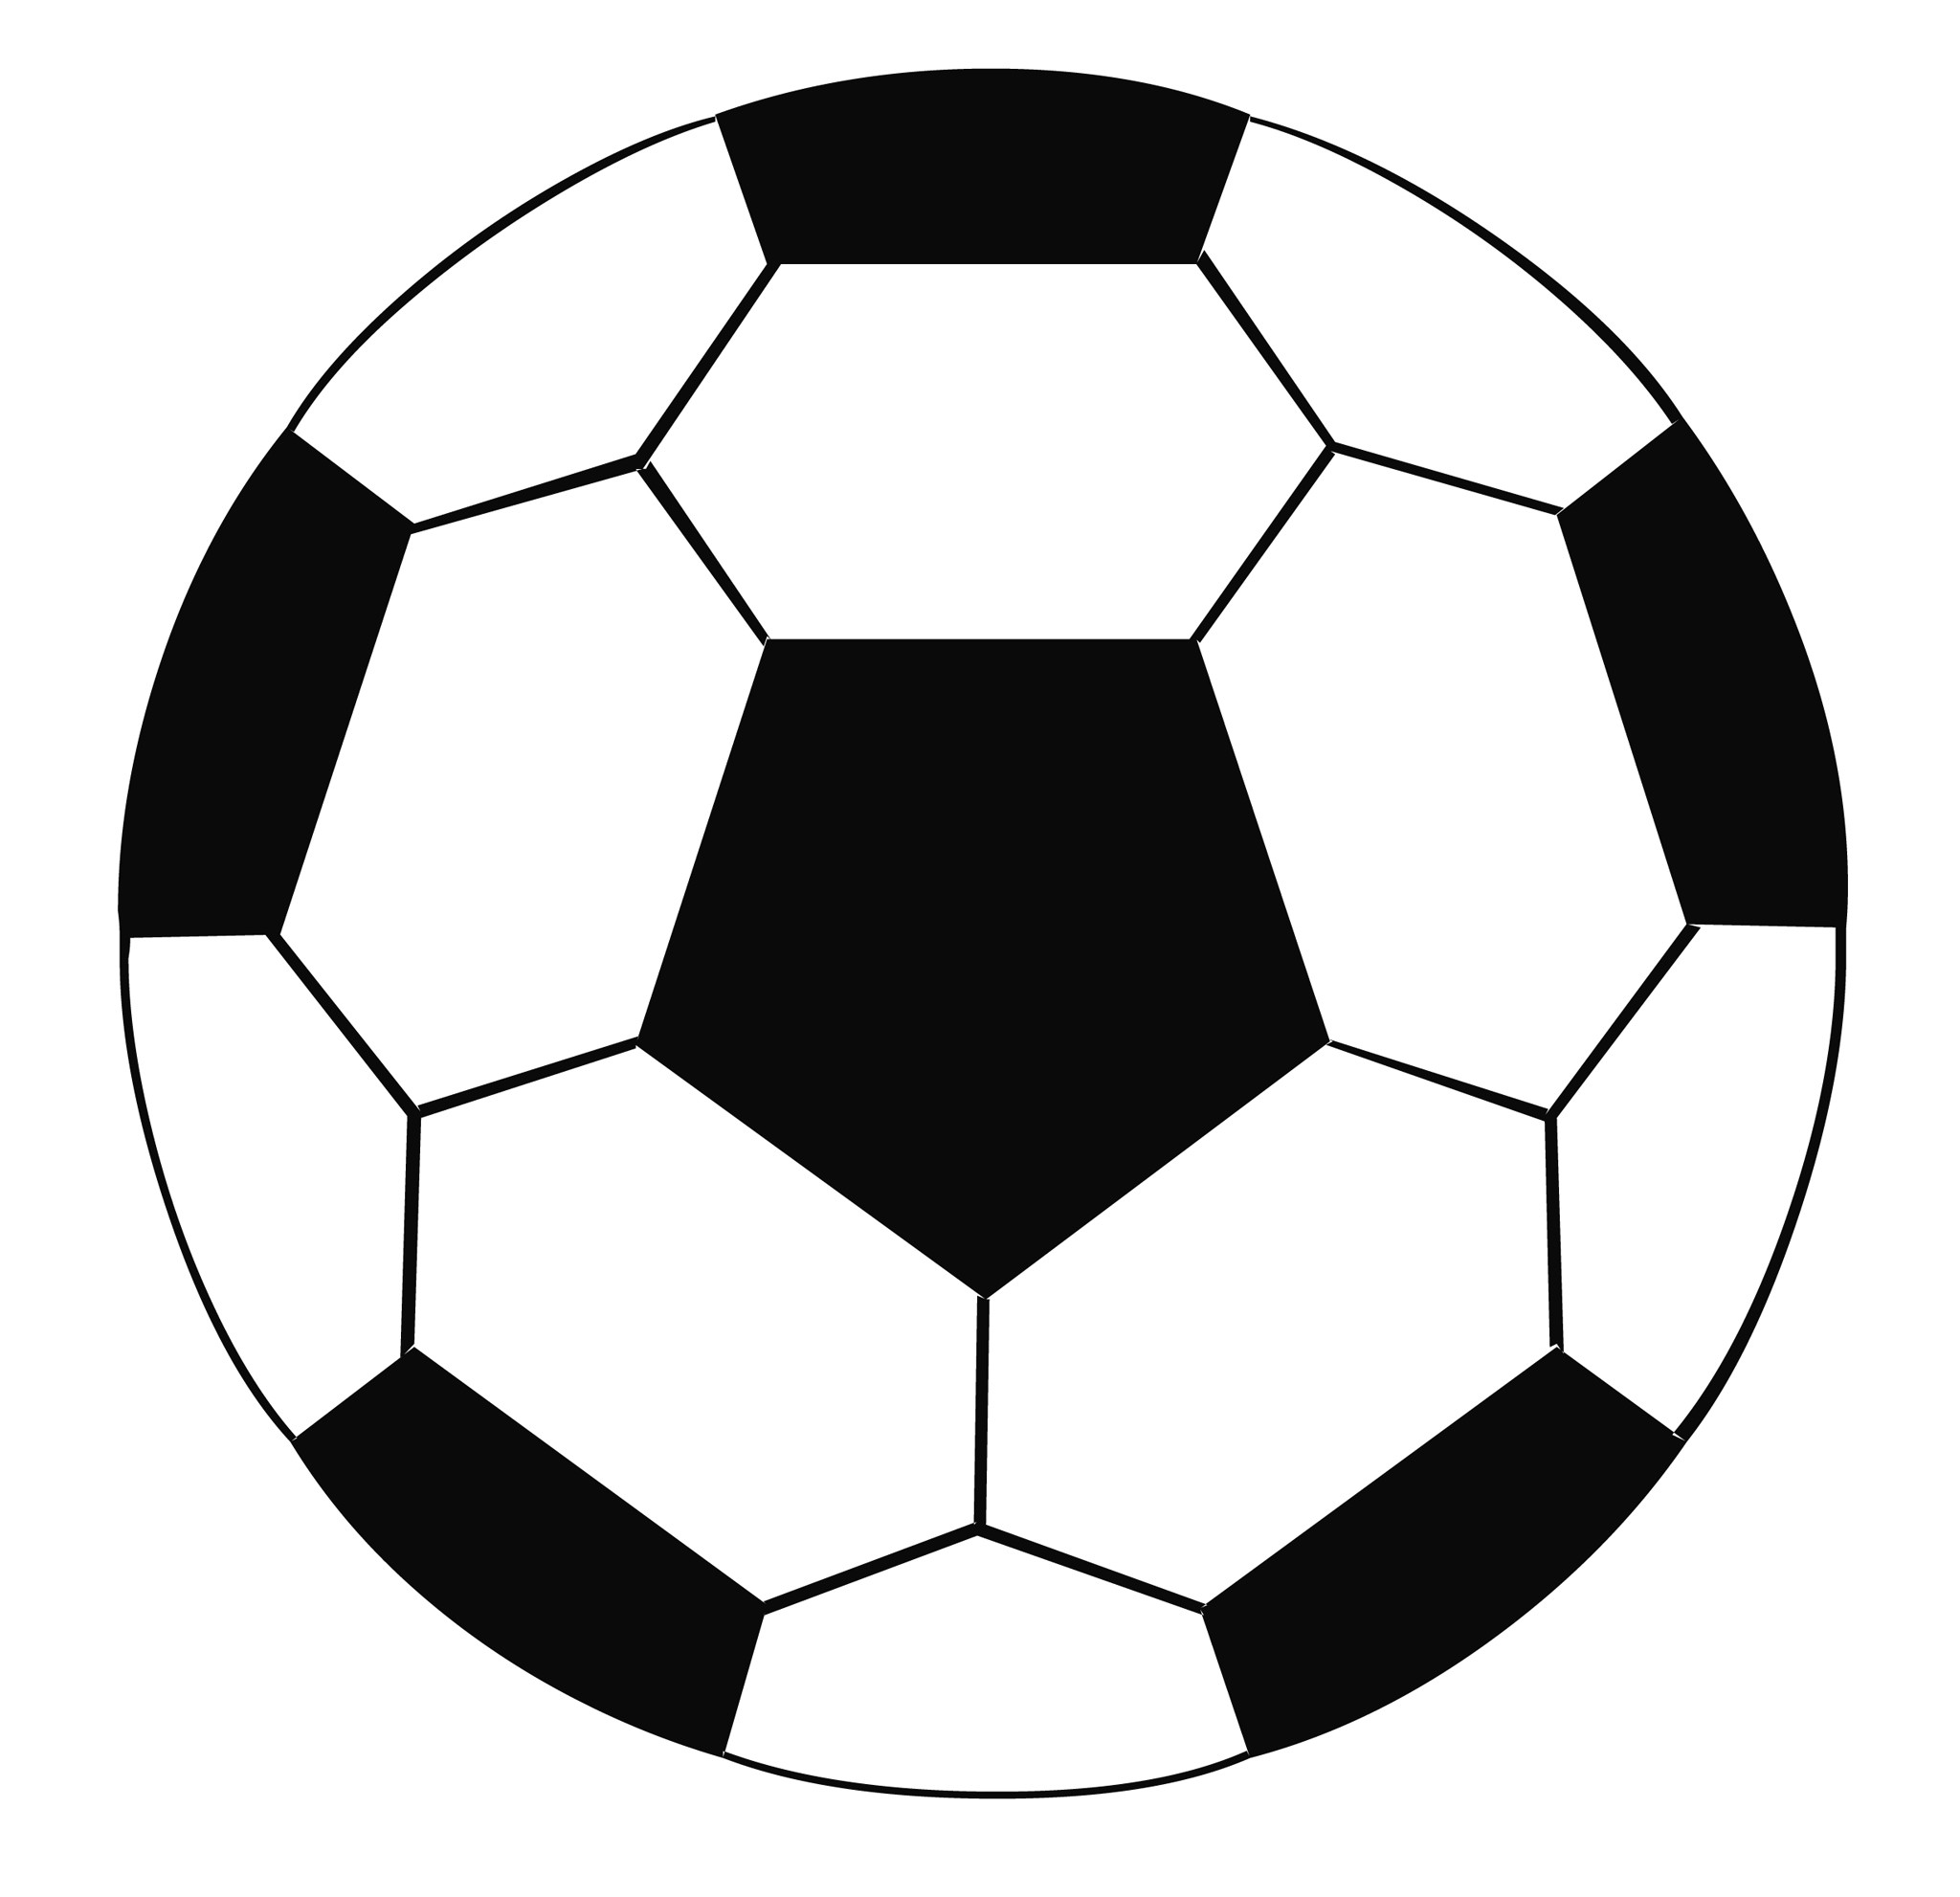 ... clip art soccer ball; Free ...-... clip art soccer ball; Free ...-6